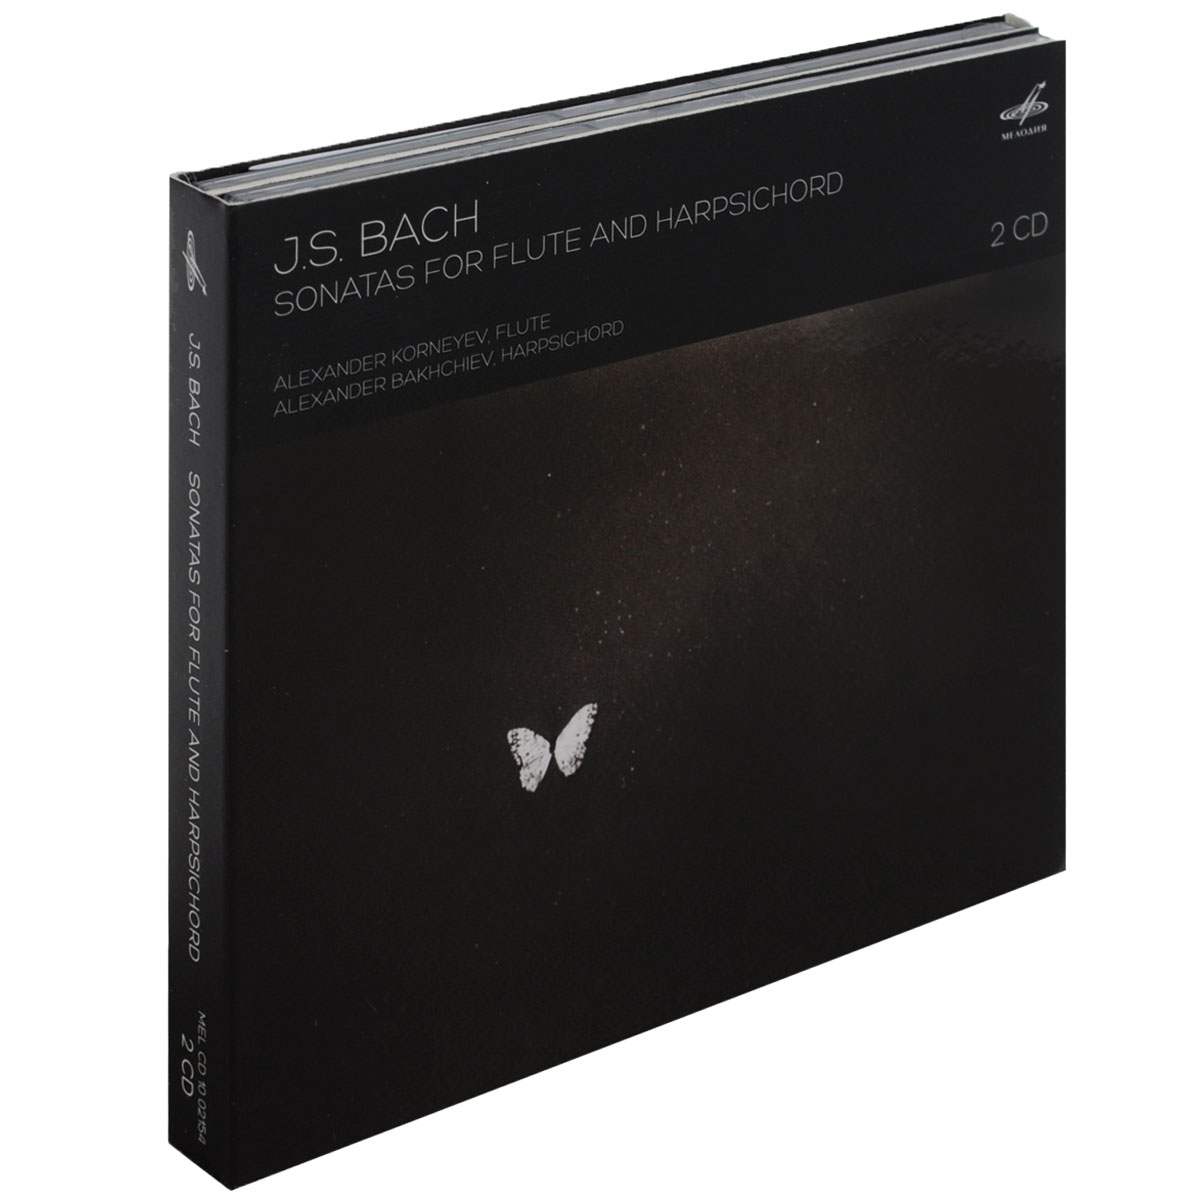 J. S. Bach. Sonatas For Flute And Harpsichord (2 CD) цены онлайн